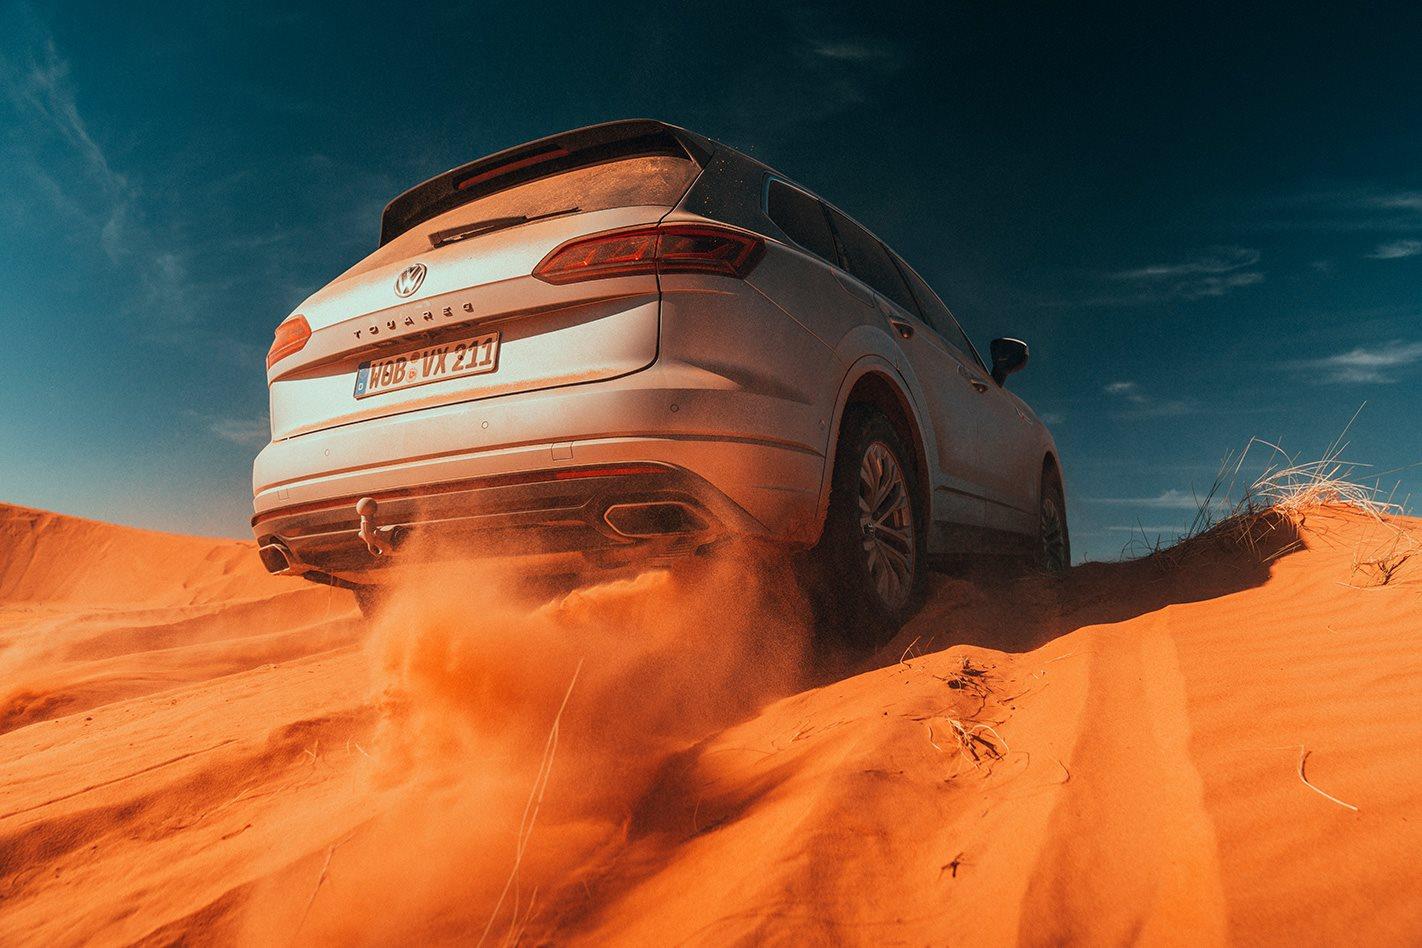 2019 Volkswagen Touareg in Morocco